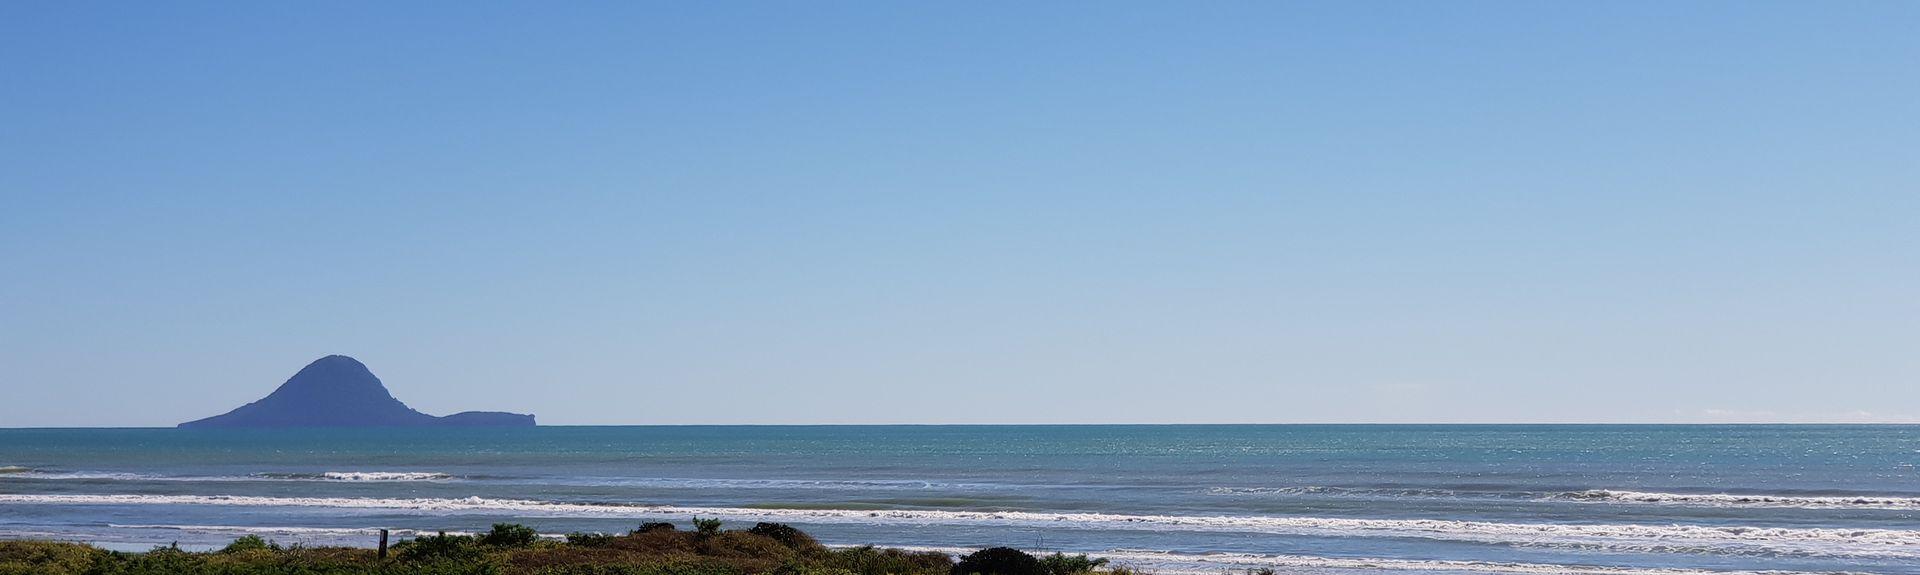 Whakatane District, Bay of Plenty Region, New Zealand